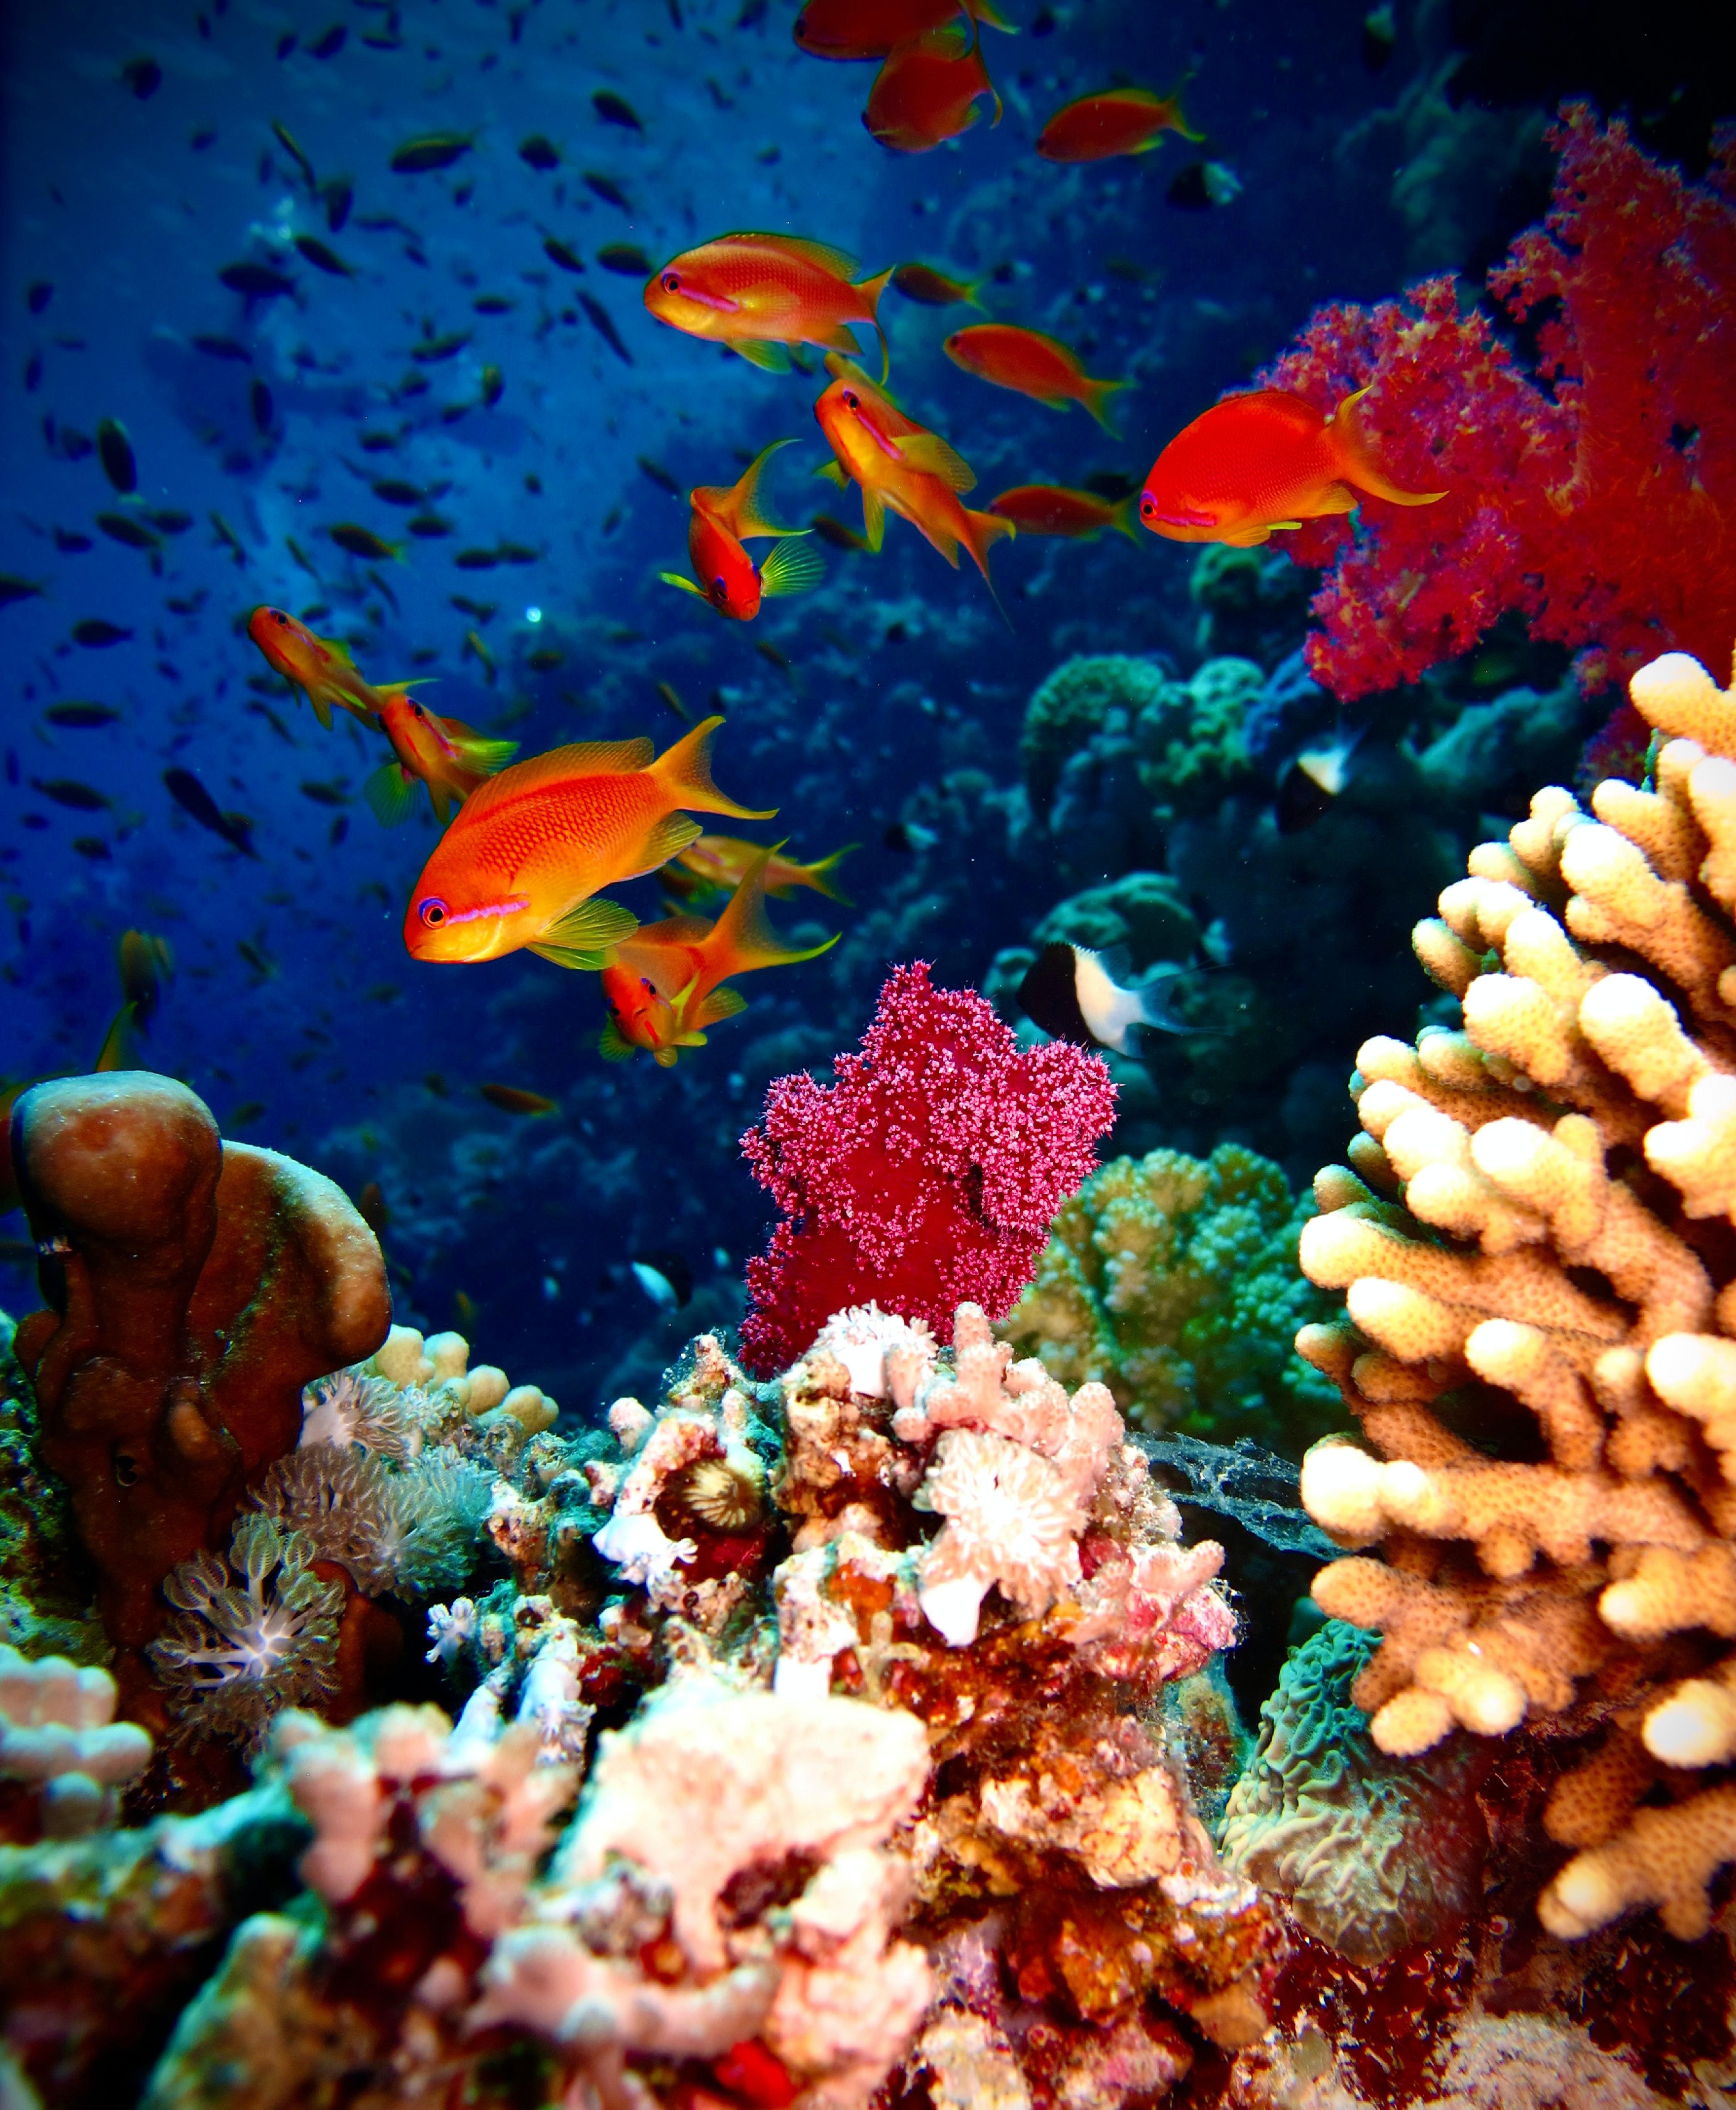 73437 Screensavers and Wallpapers Aquarium for phone. Download Animals, Coral, Aquarium, Fish, Reef pictures for free